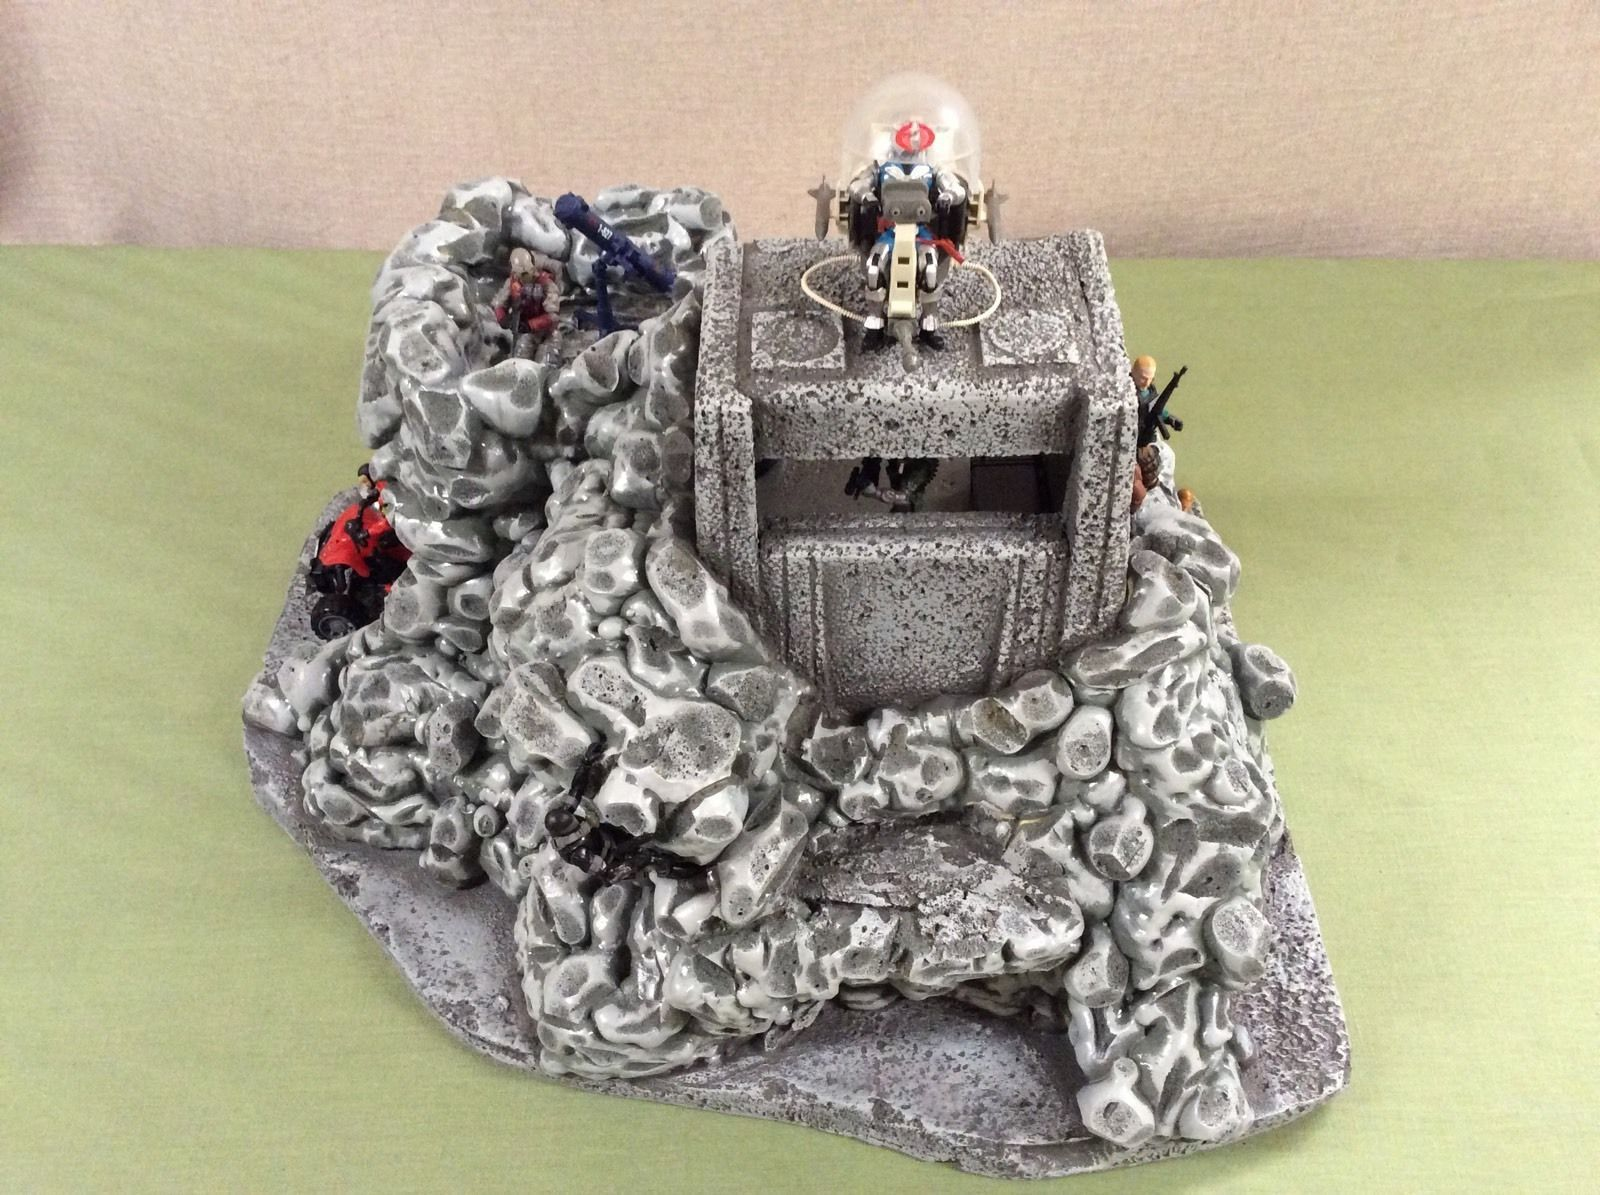 Custom GI Joe Mountain Base Diorama   Model Trains, Dioramic, & Lego